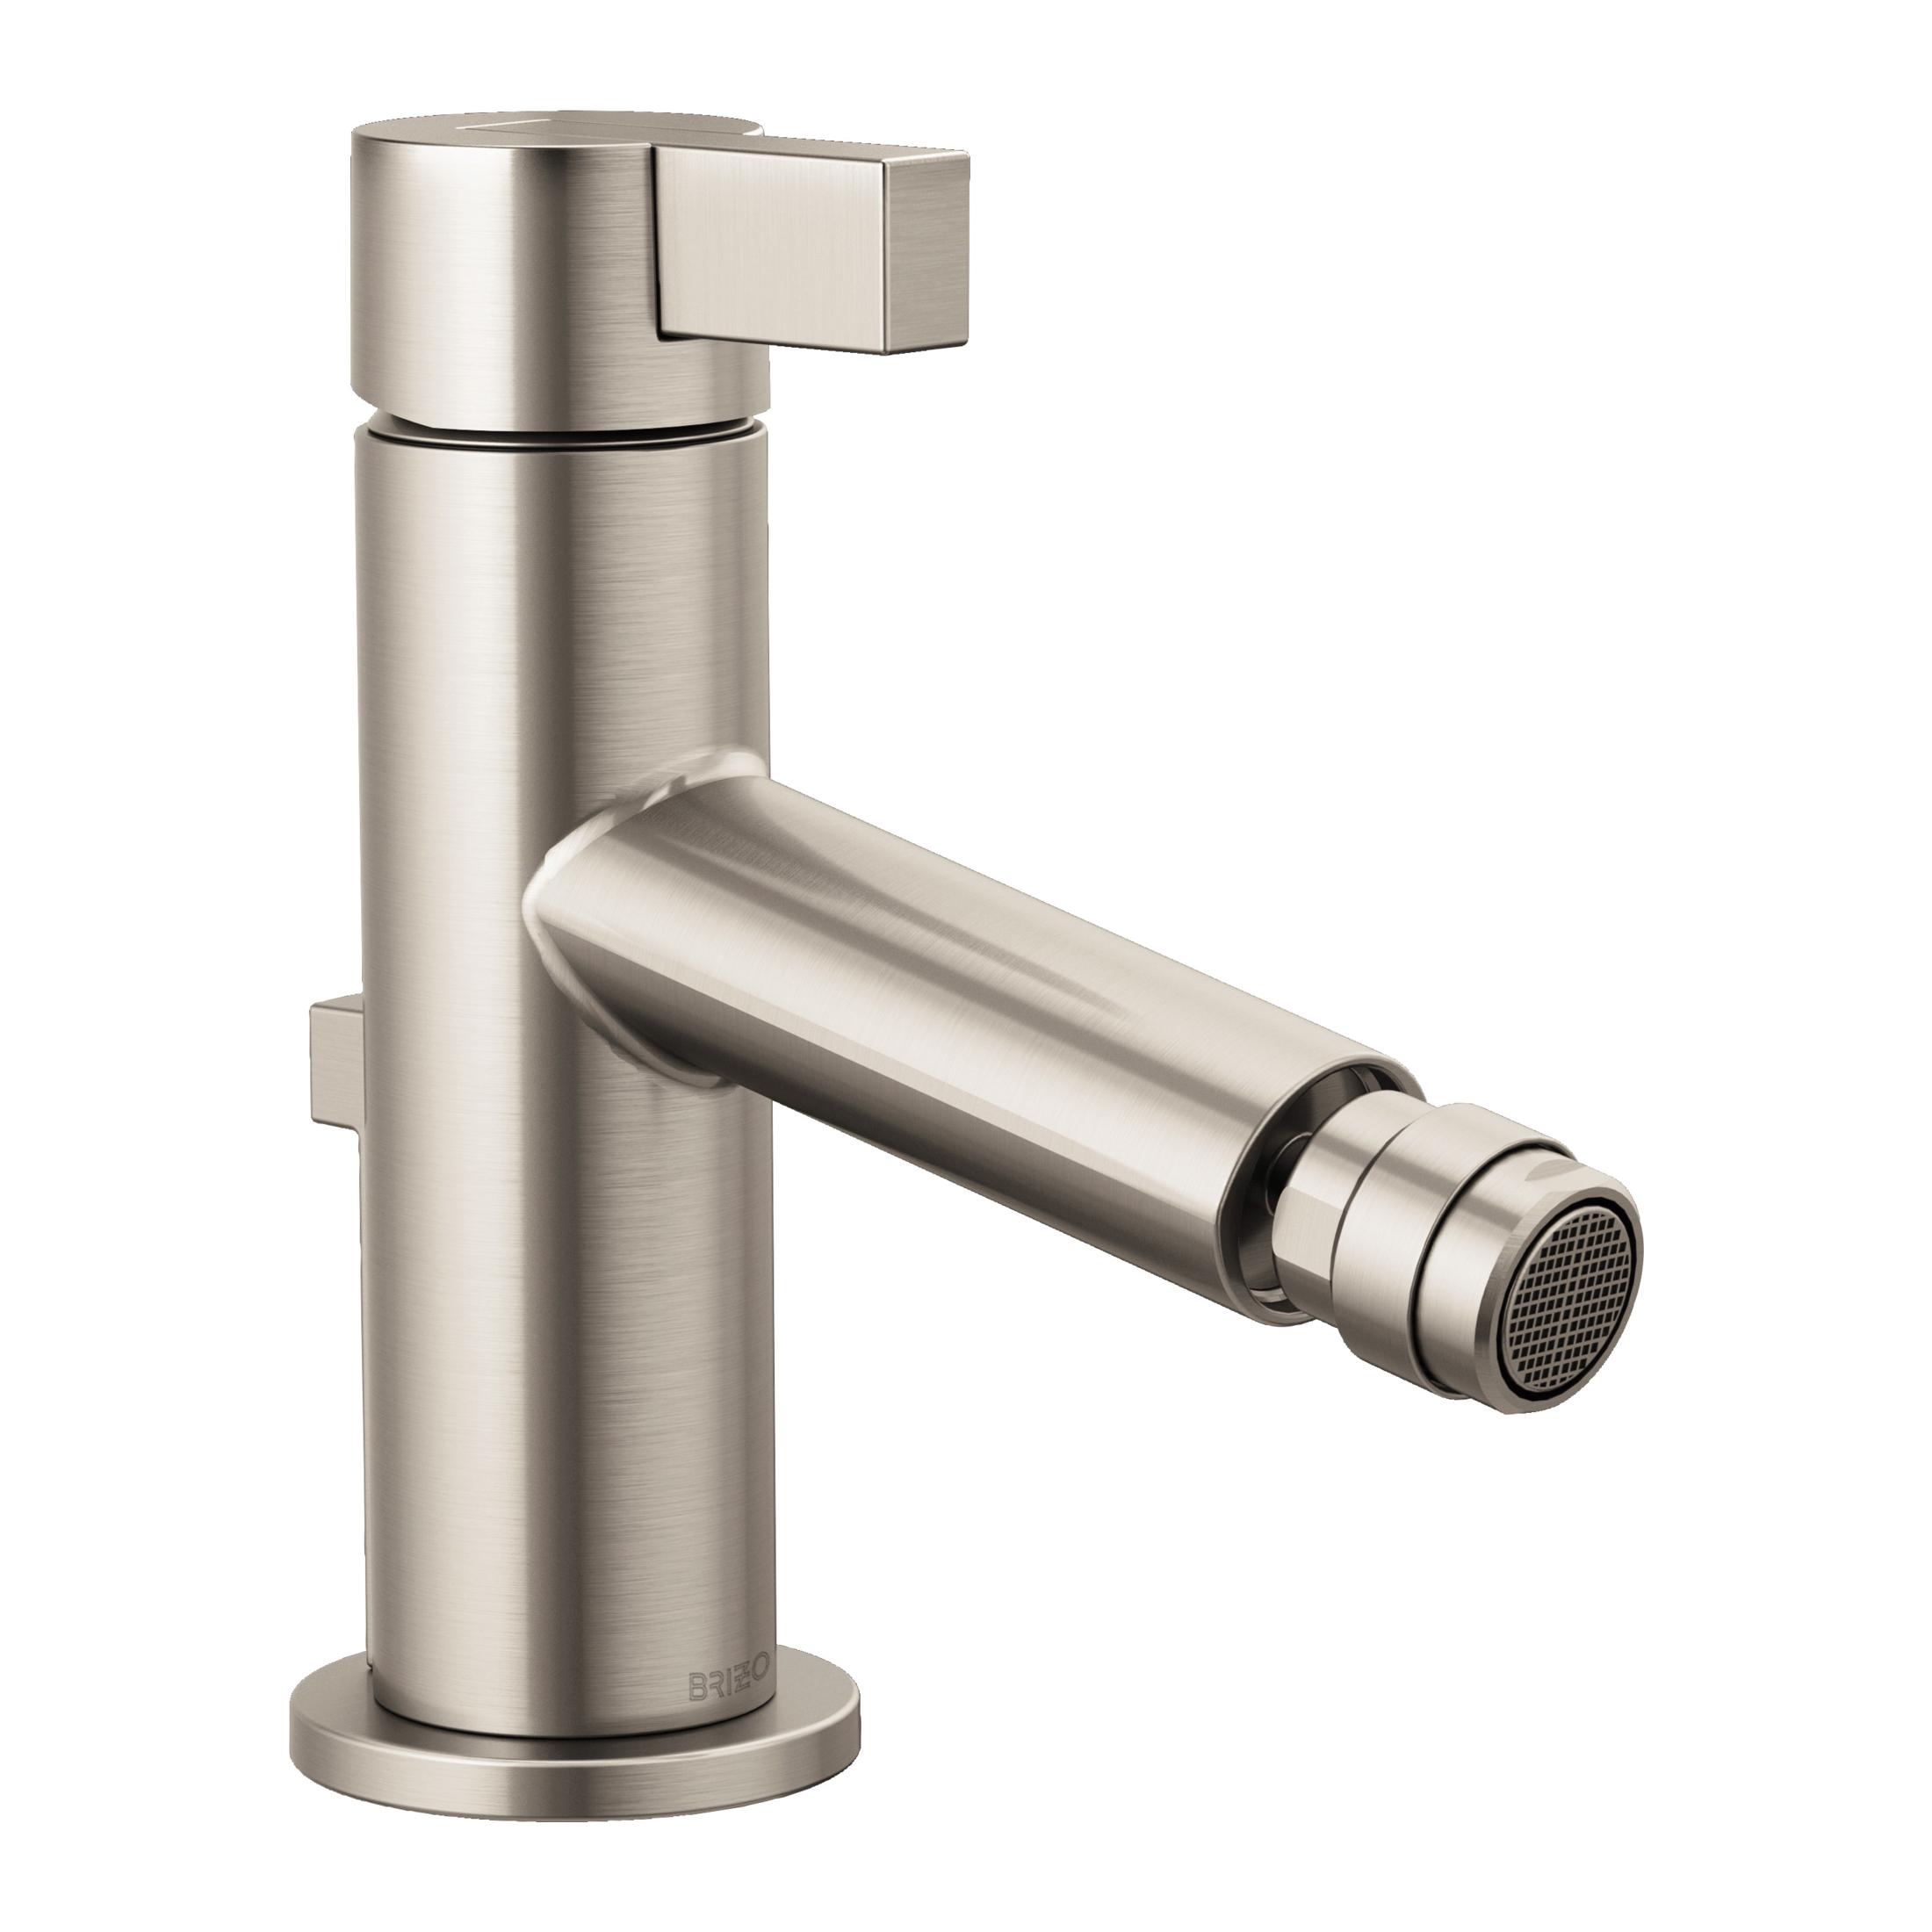 Brizo® 68135-NK Litze™ Bidet Faucet, 2-1/2 in H Spout, 1 Handle, Pop-Up Drain, Luxe Nickel, Import, Commercial